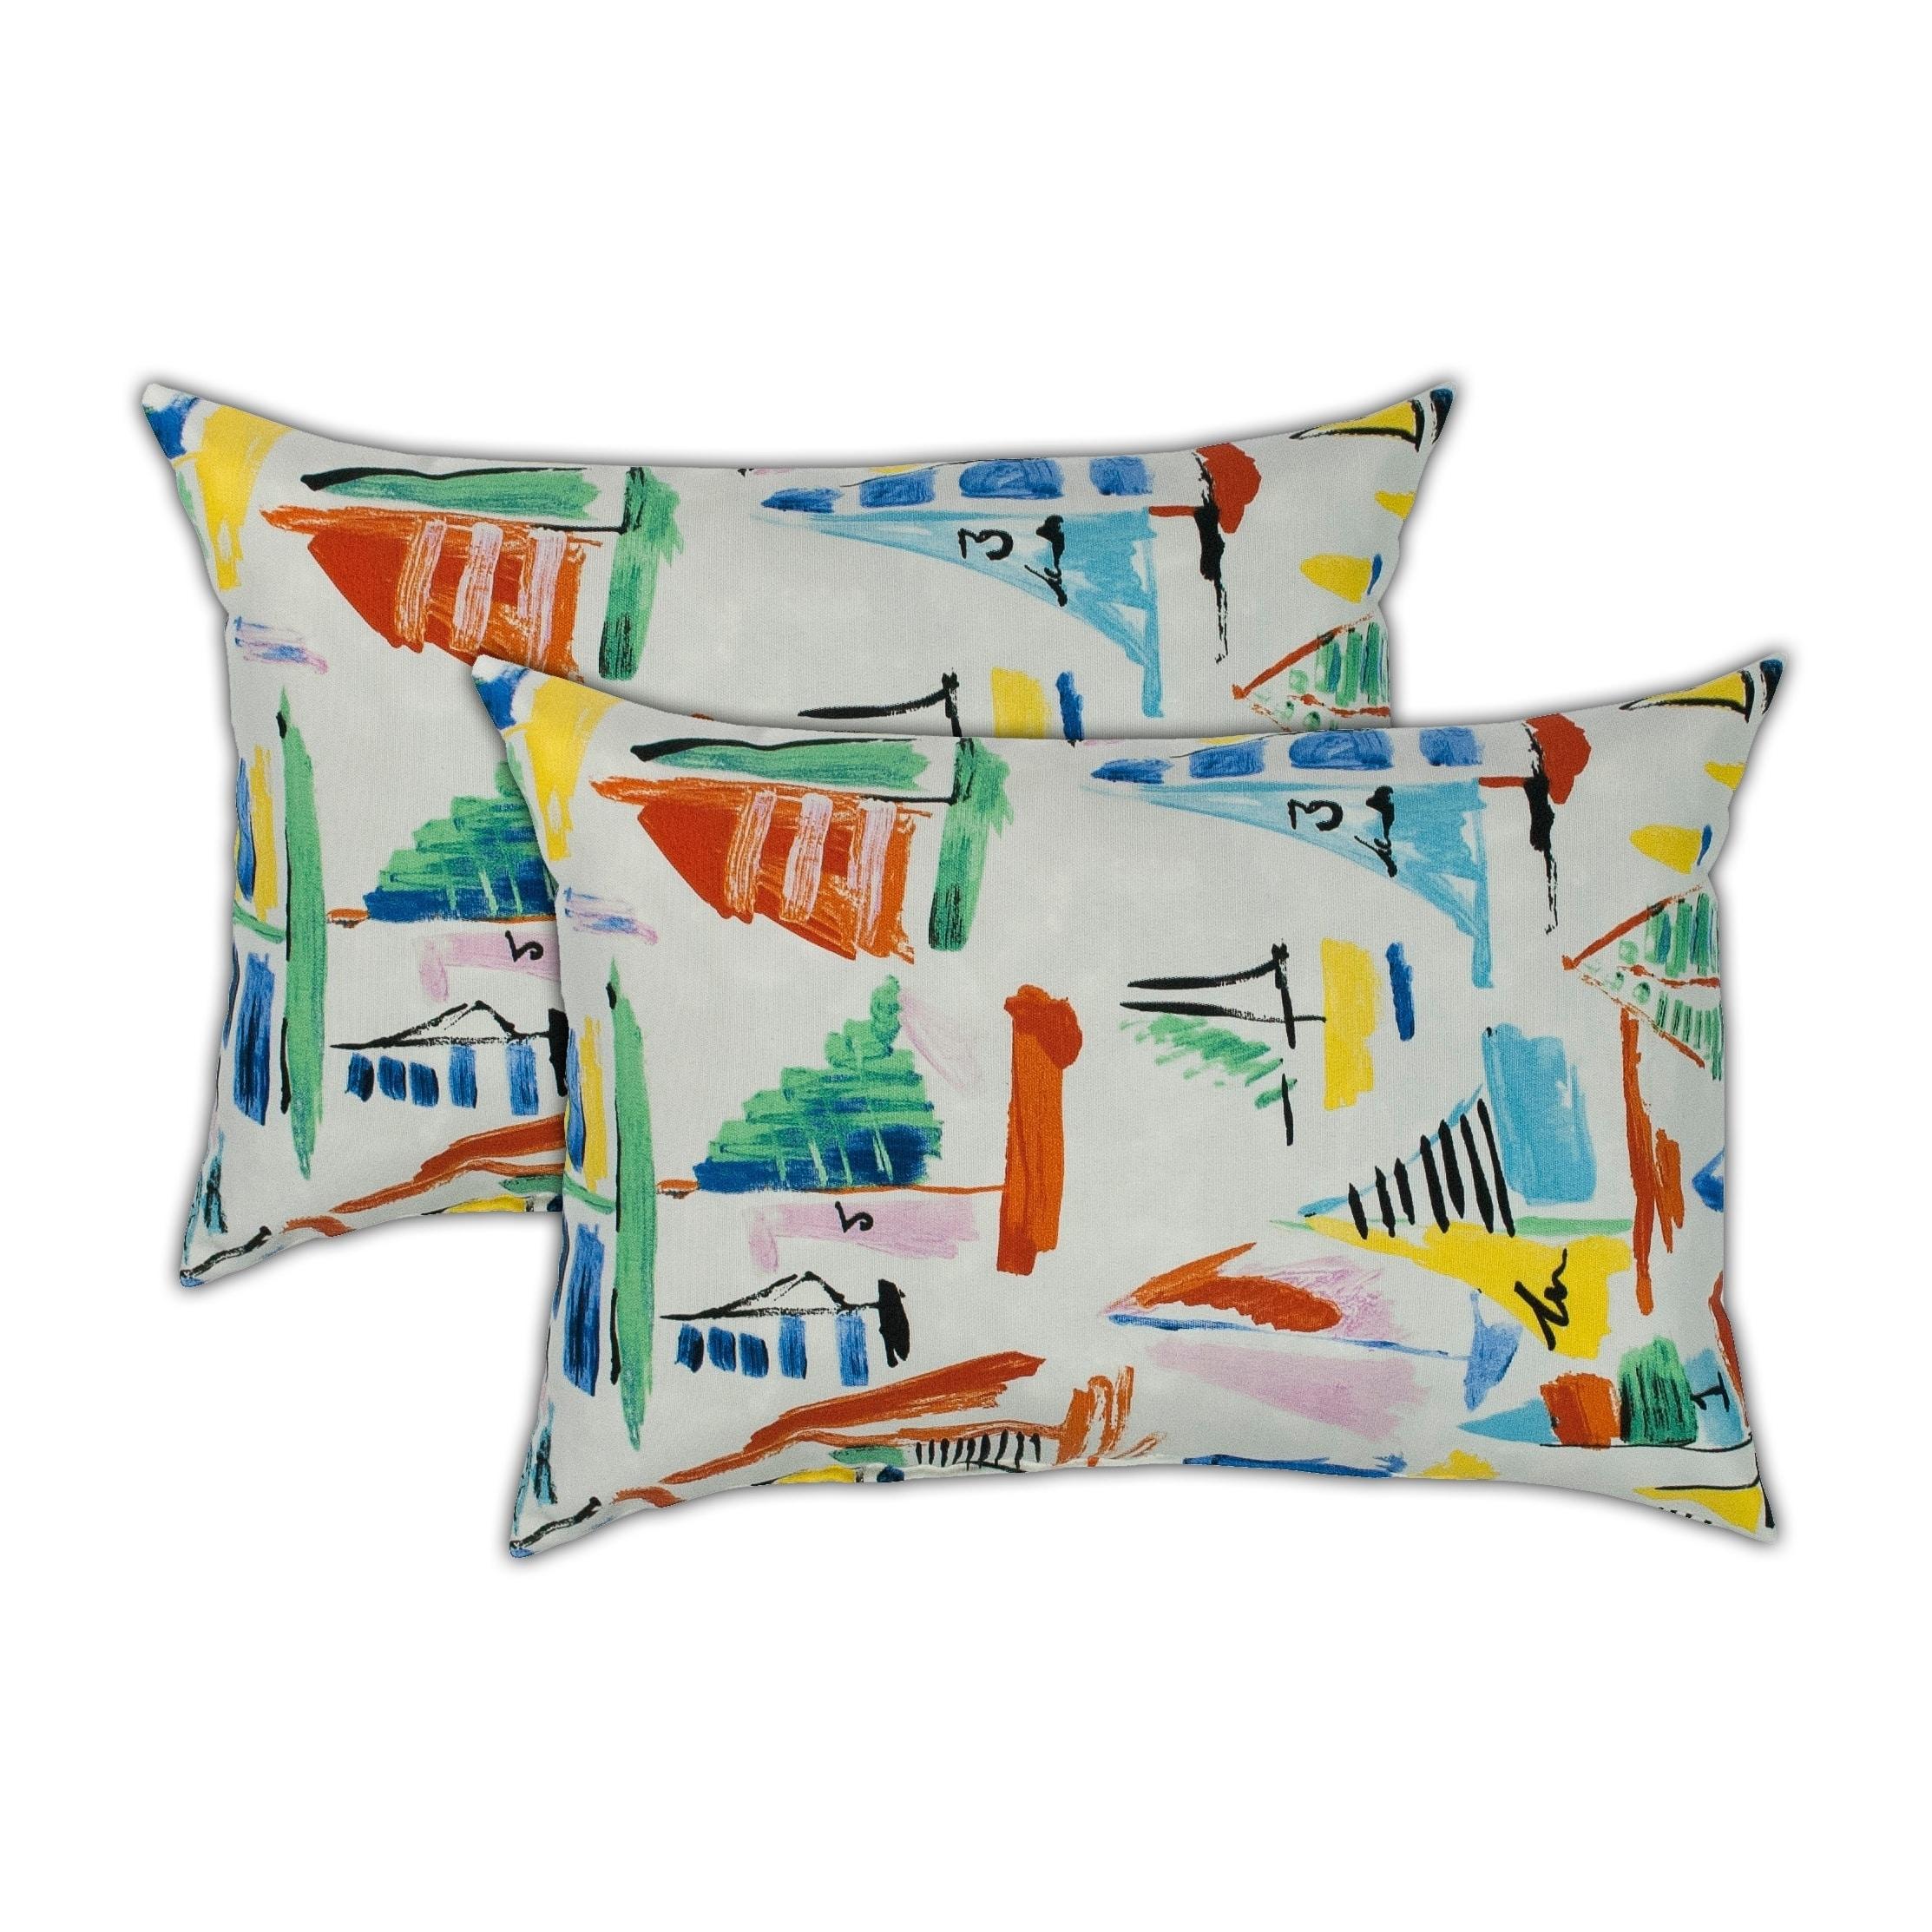 Sherry Kline Sailboat Boudoir Outdoor Pillows (Set of 2)